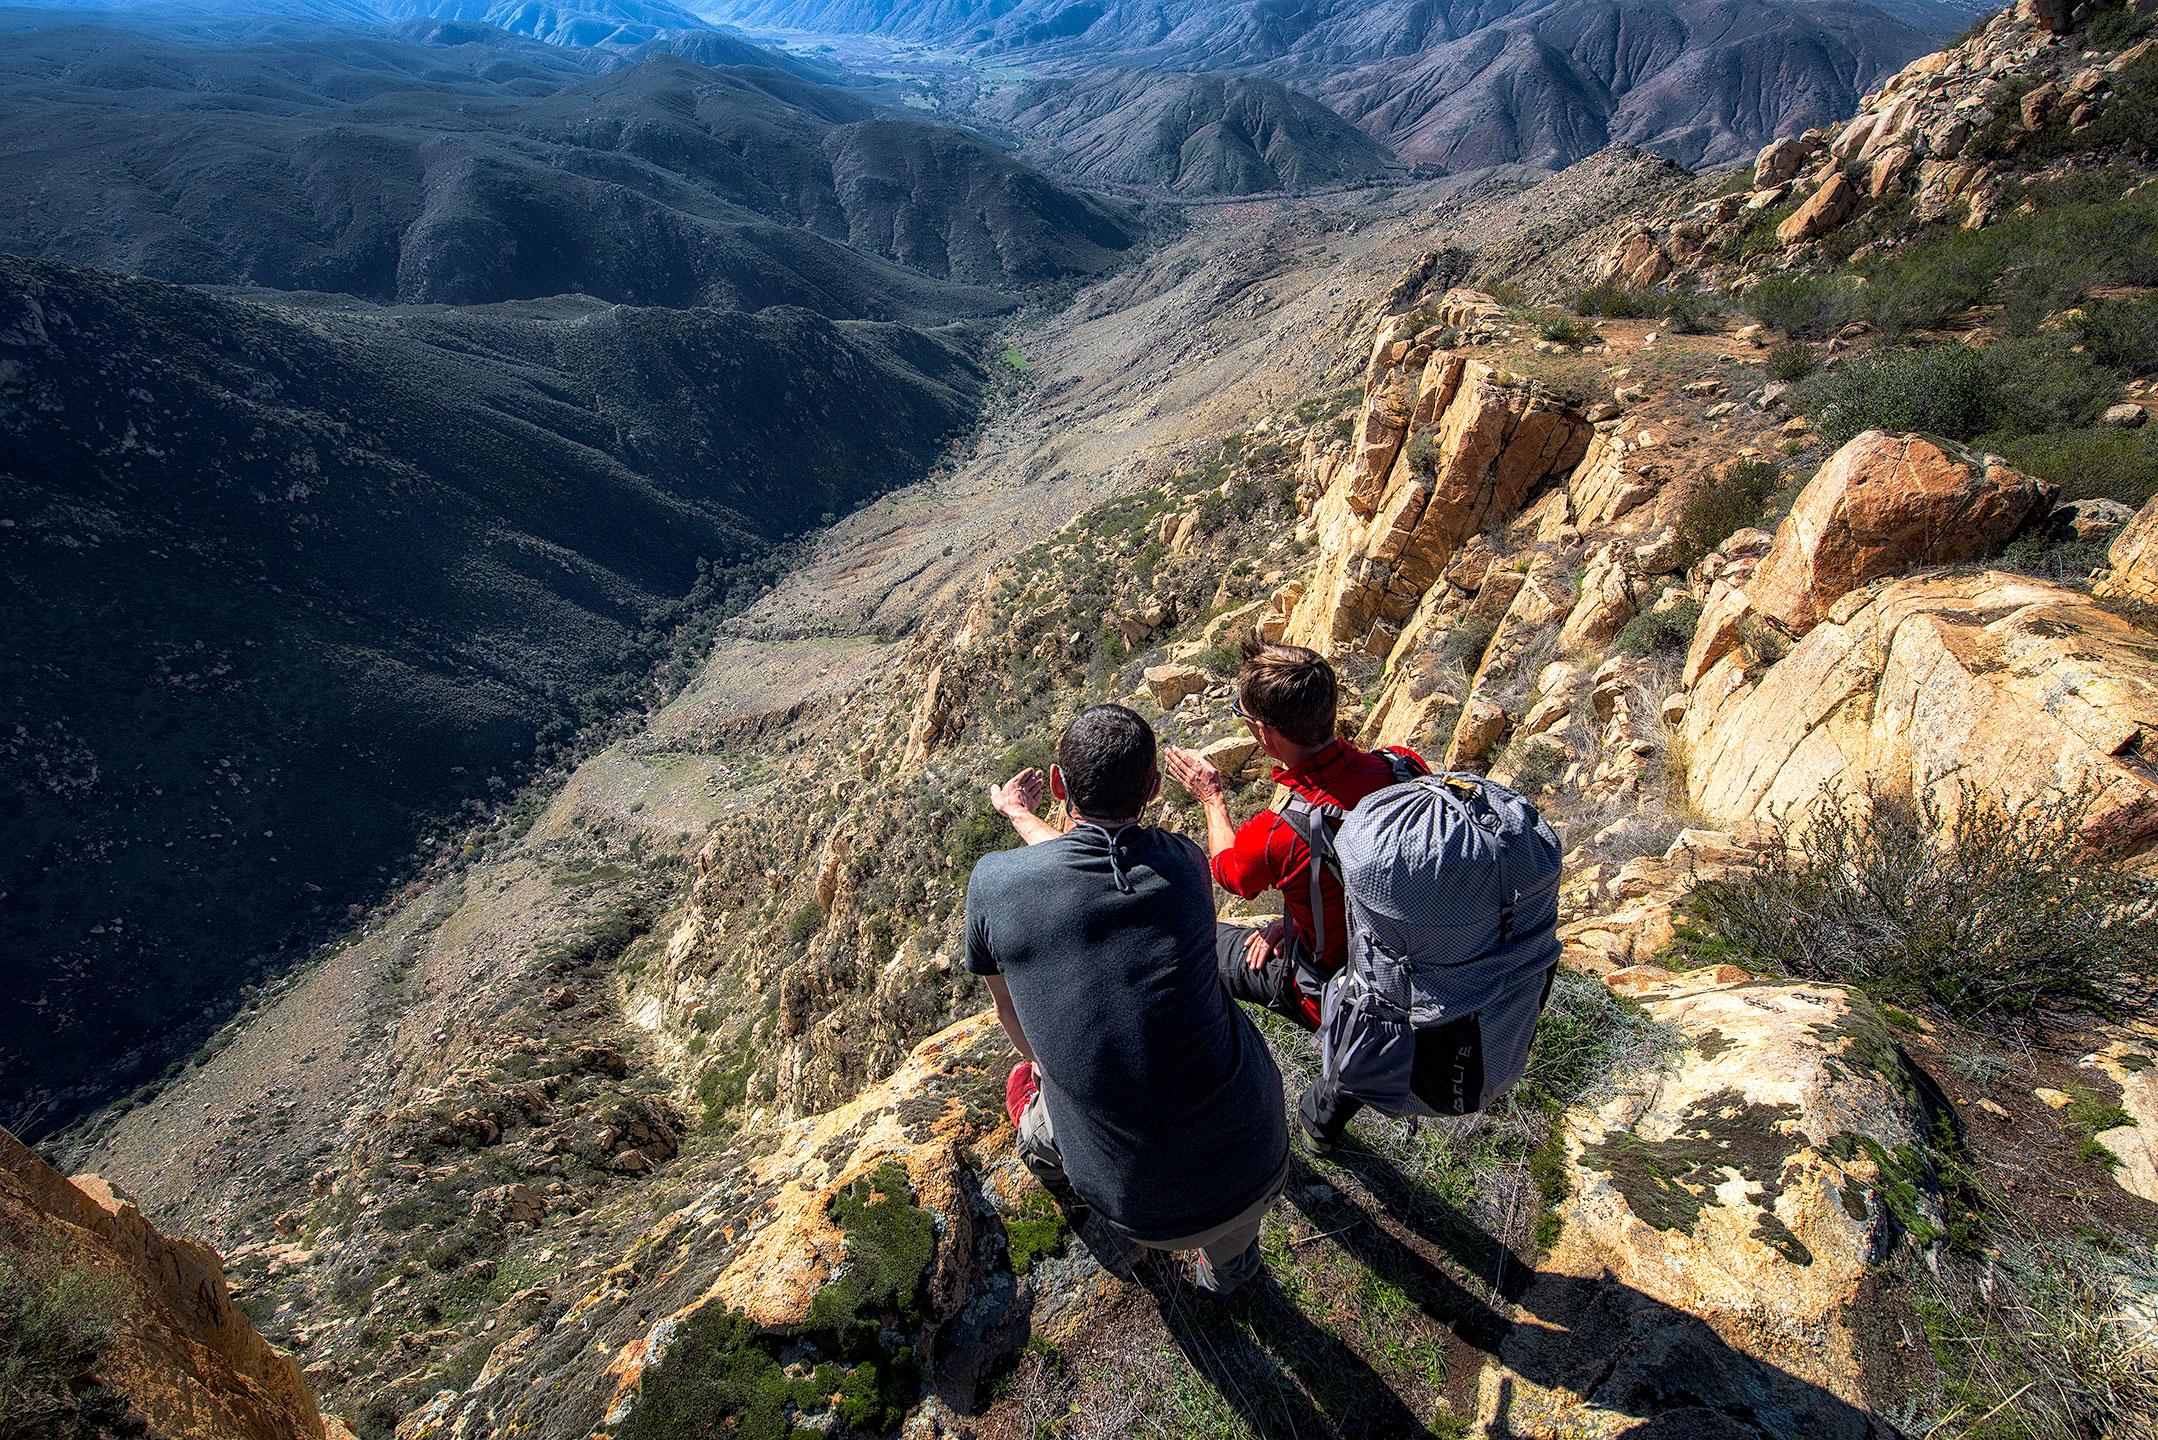 austin-trigg-wing-suit-base-jump-fly-san-diego-socal-lifestyle-california-adventure-thrill-seeking--plotting.jpg